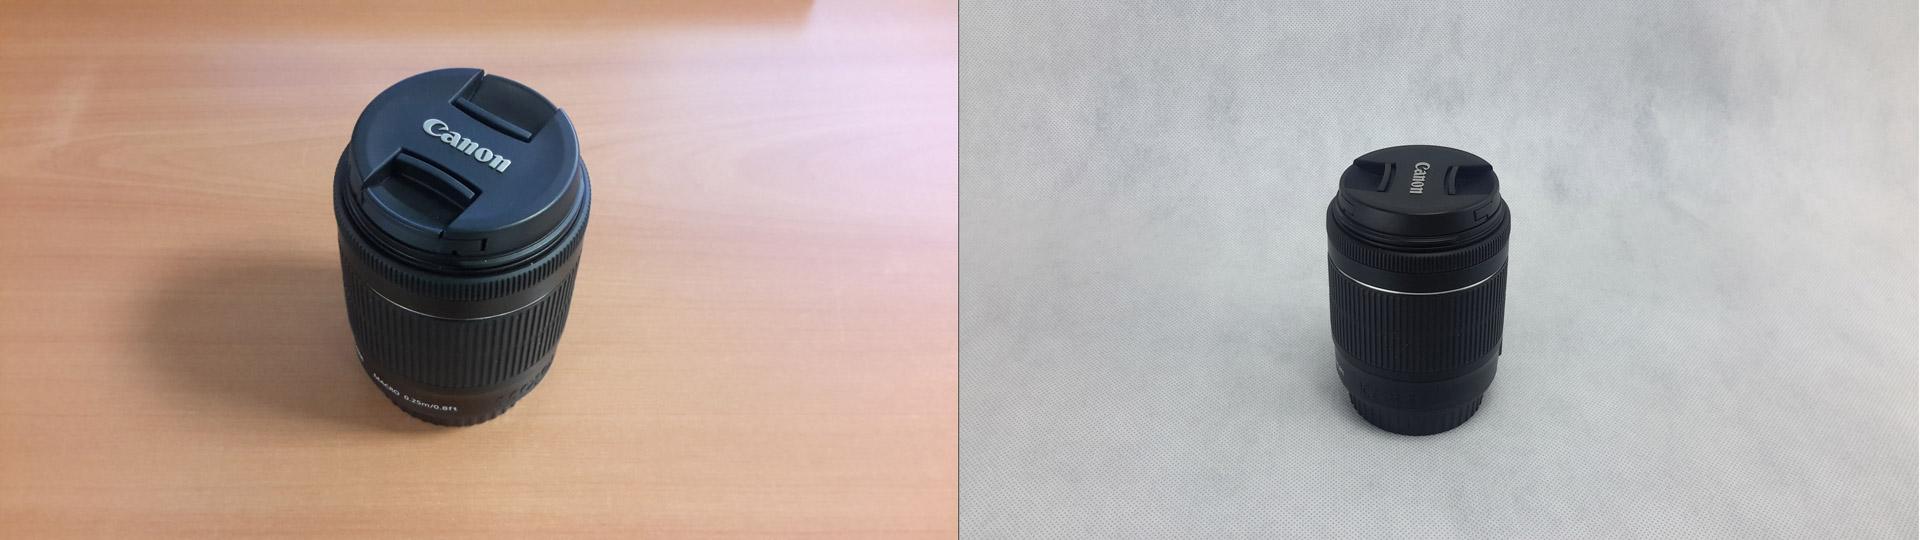 test-tablette-samsung-apn-clichés